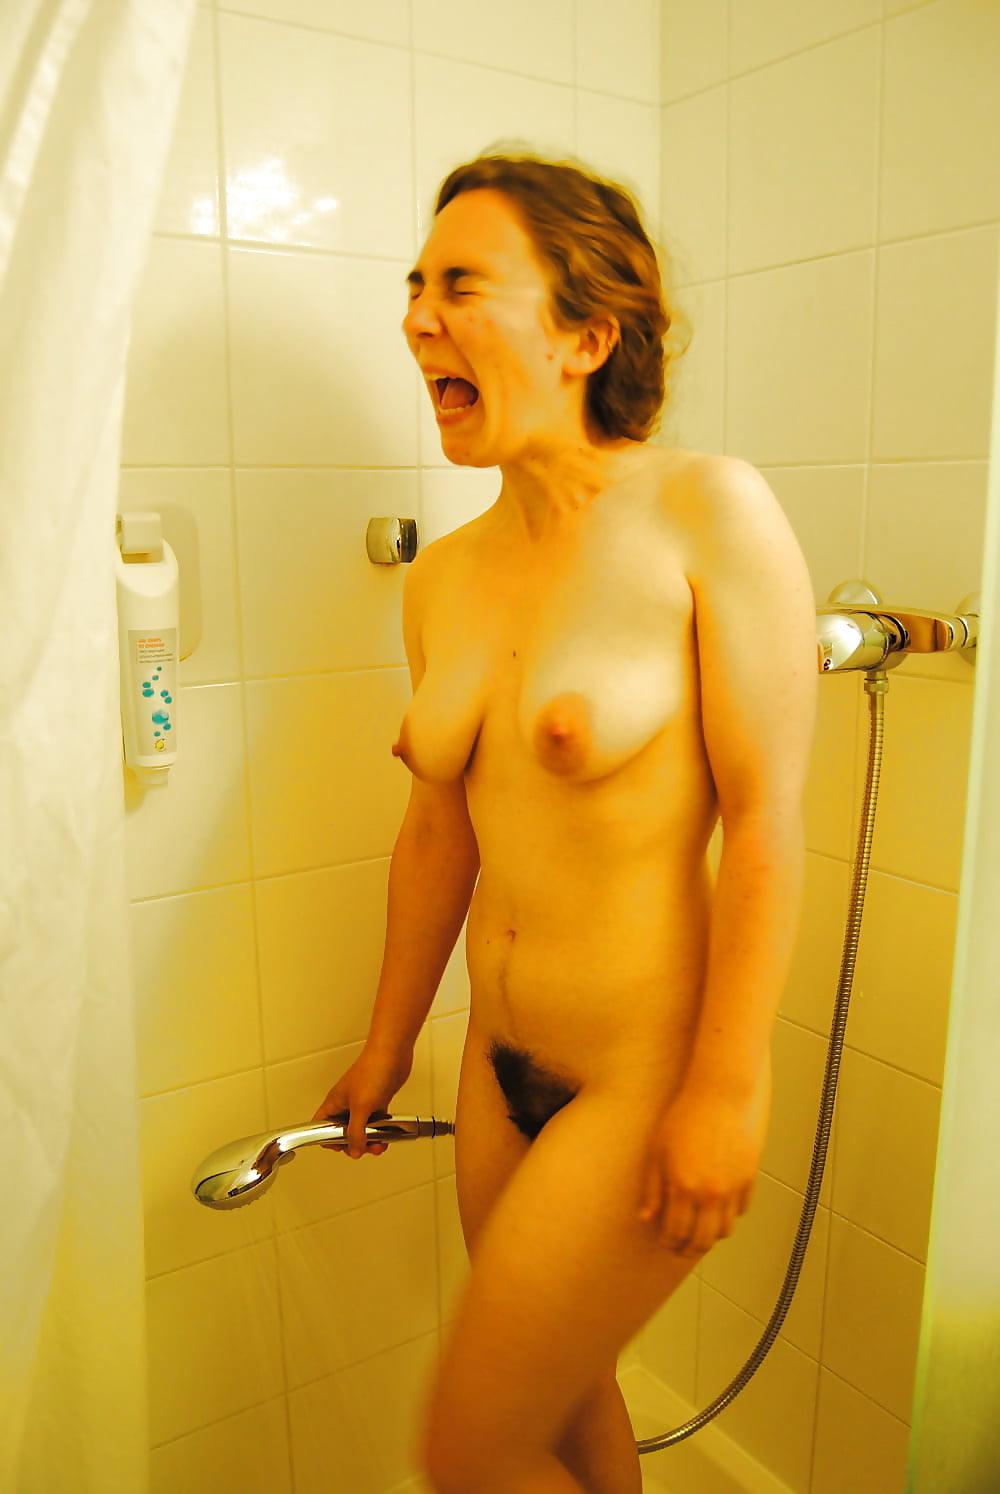 Drunk Mom Caught Naked